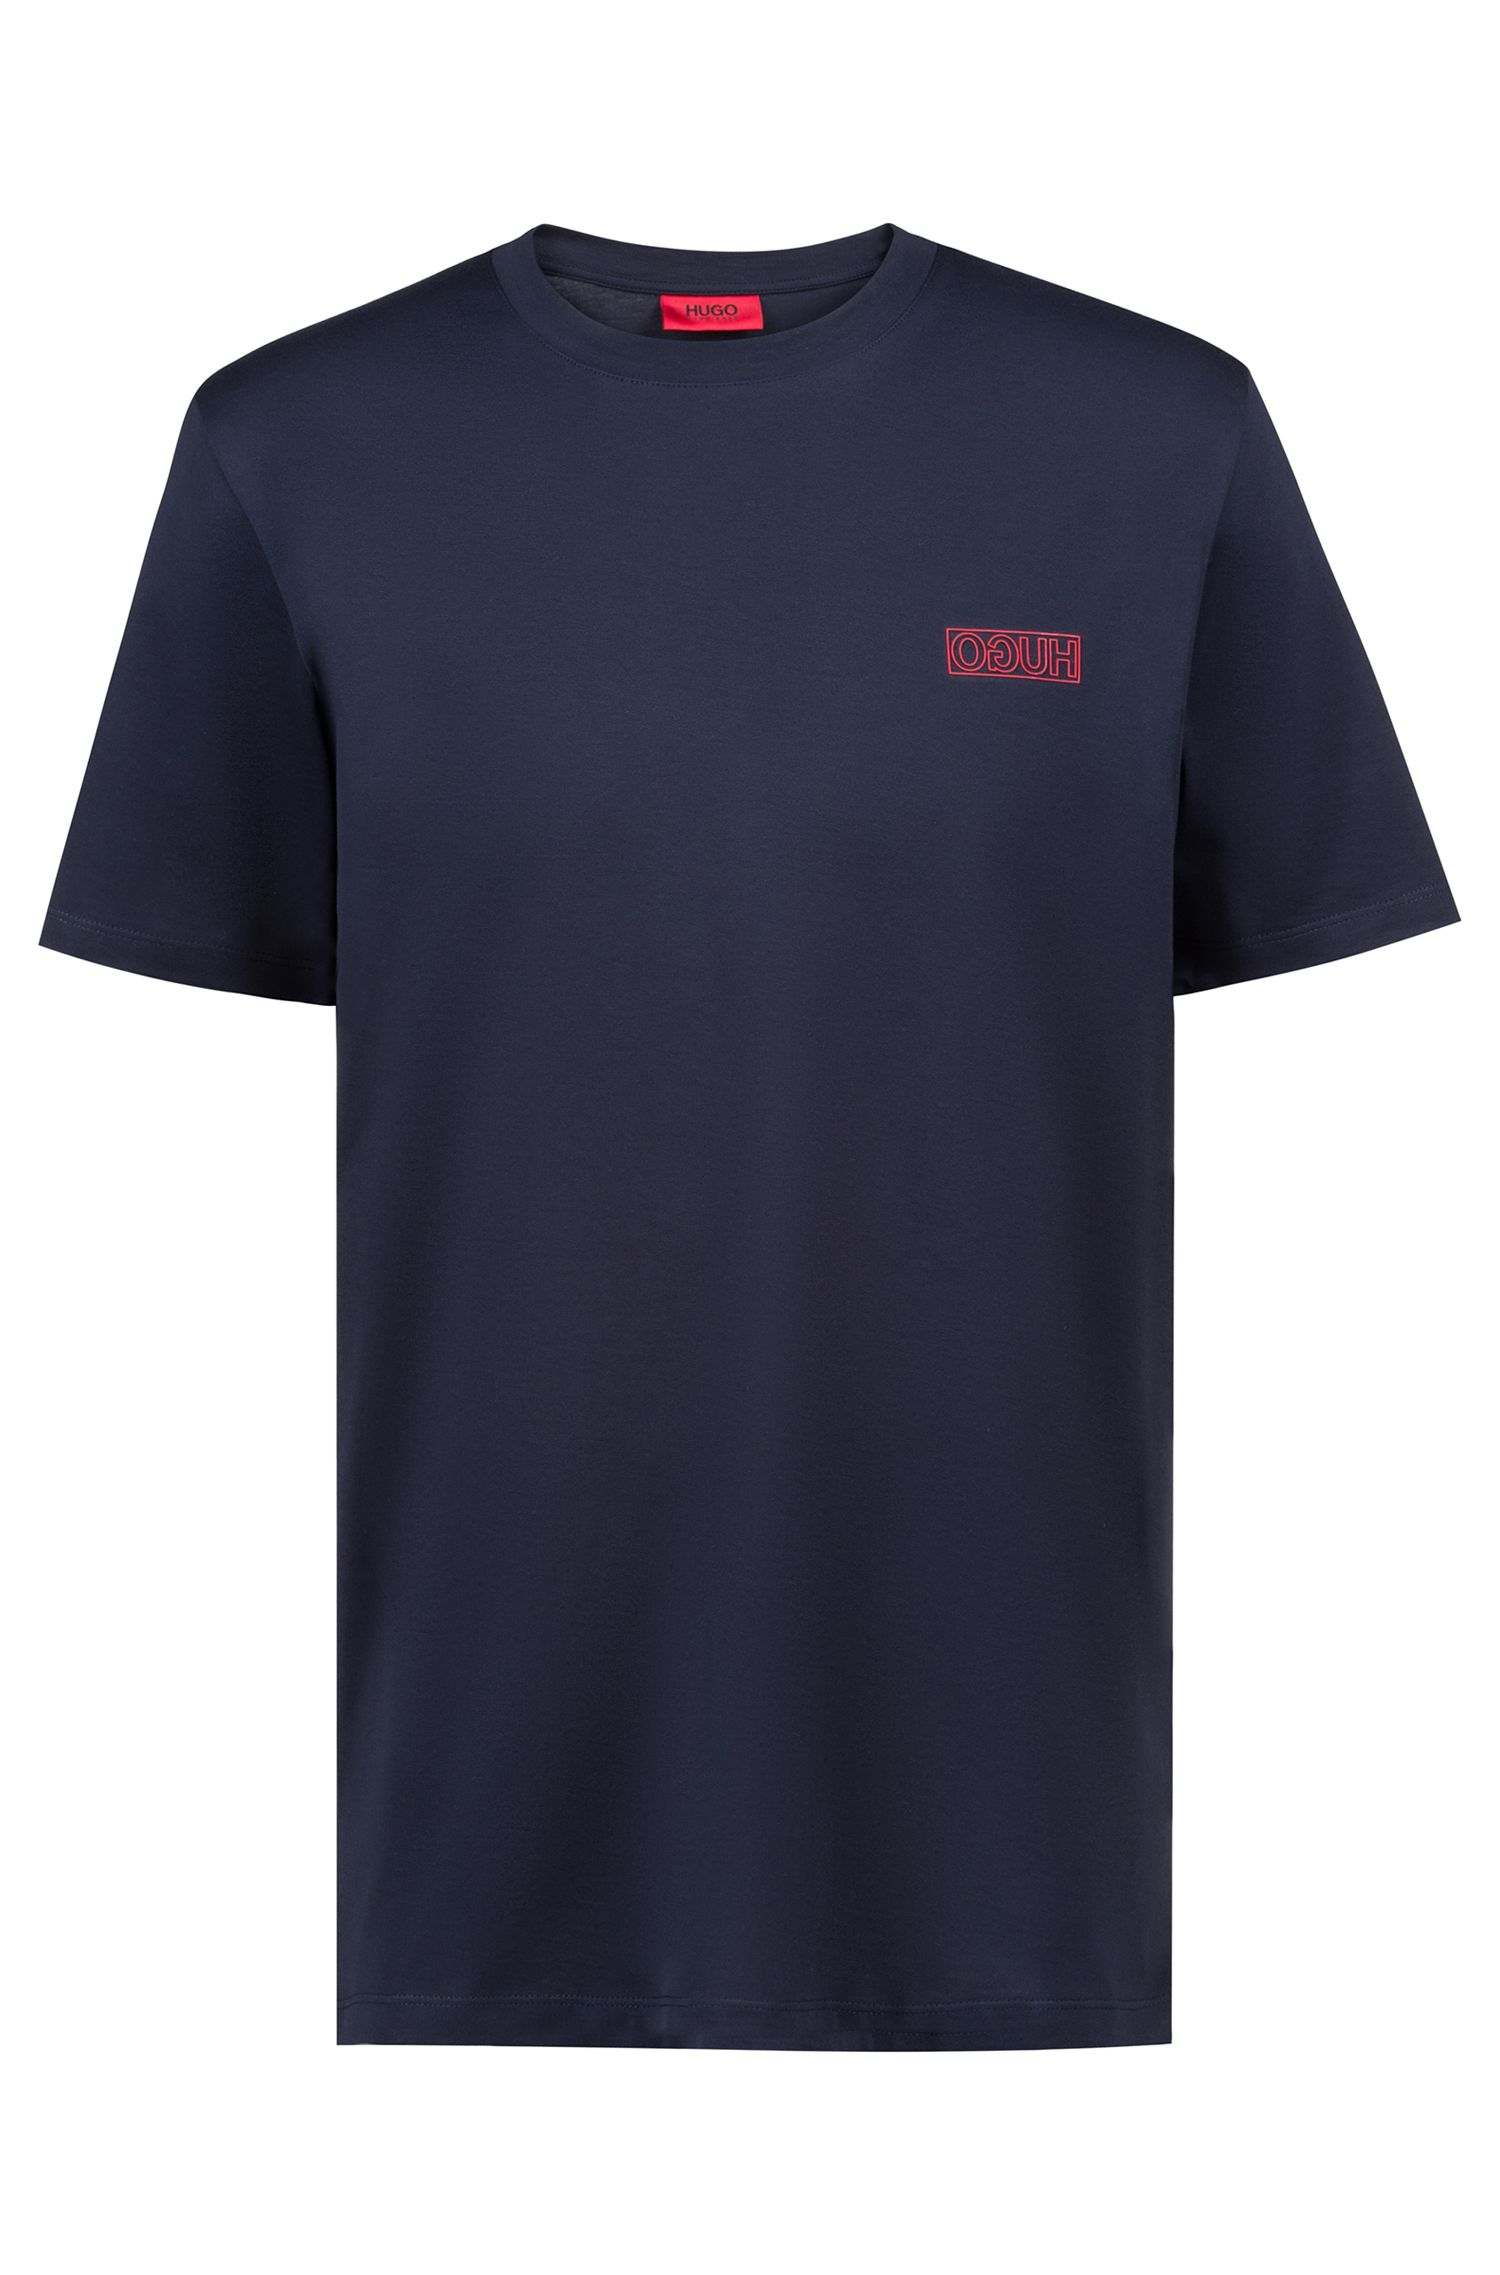 Cotton T-shirt with reverse logo, Dark Blue